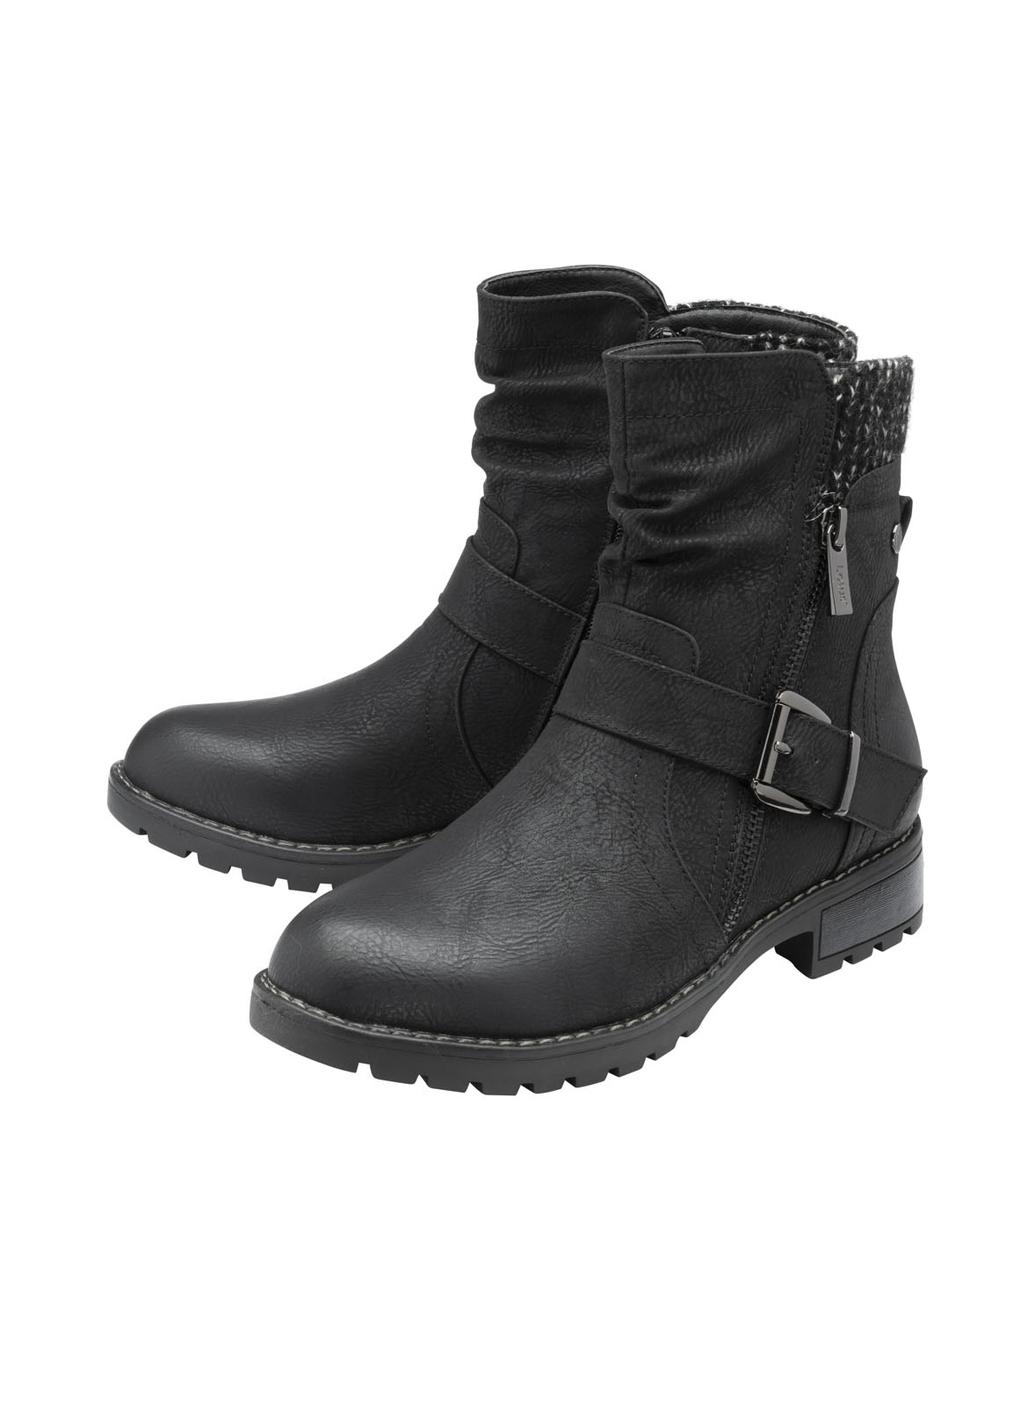 Lotus Jemma Mid-Calf Boots in Black